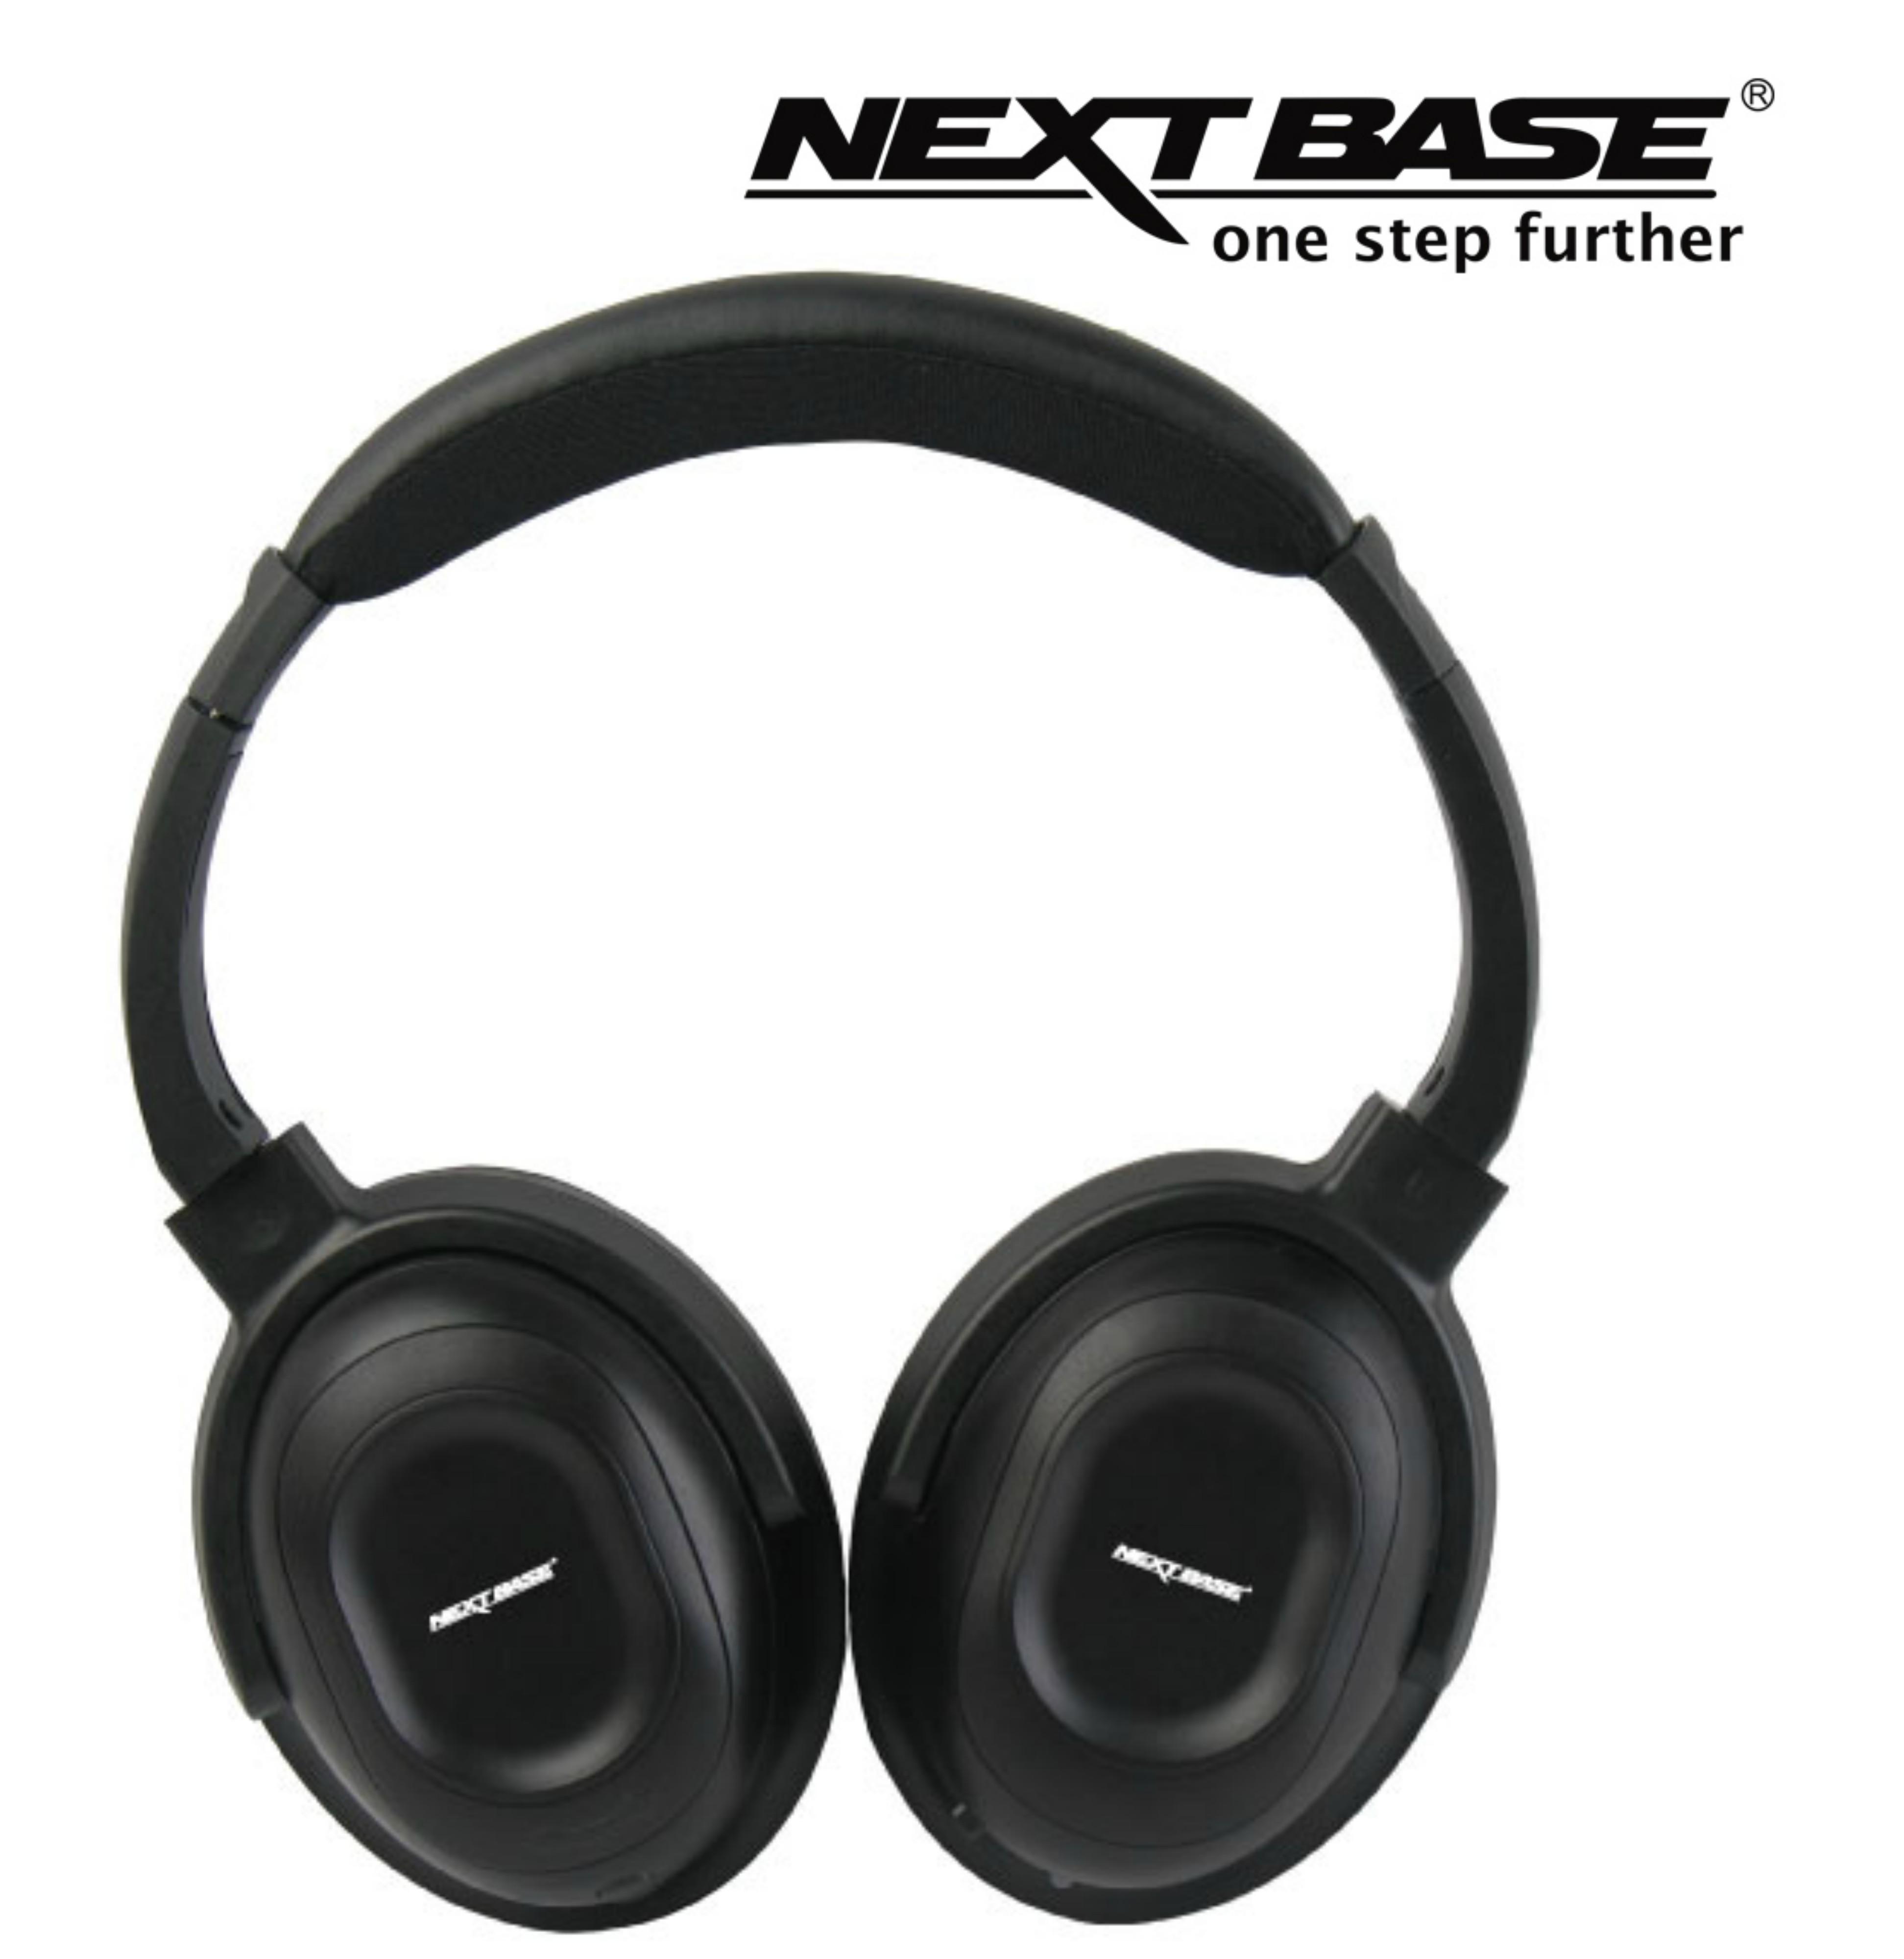 Nextbase Click & Go Series Wireless Headphones Black - NBCARHP